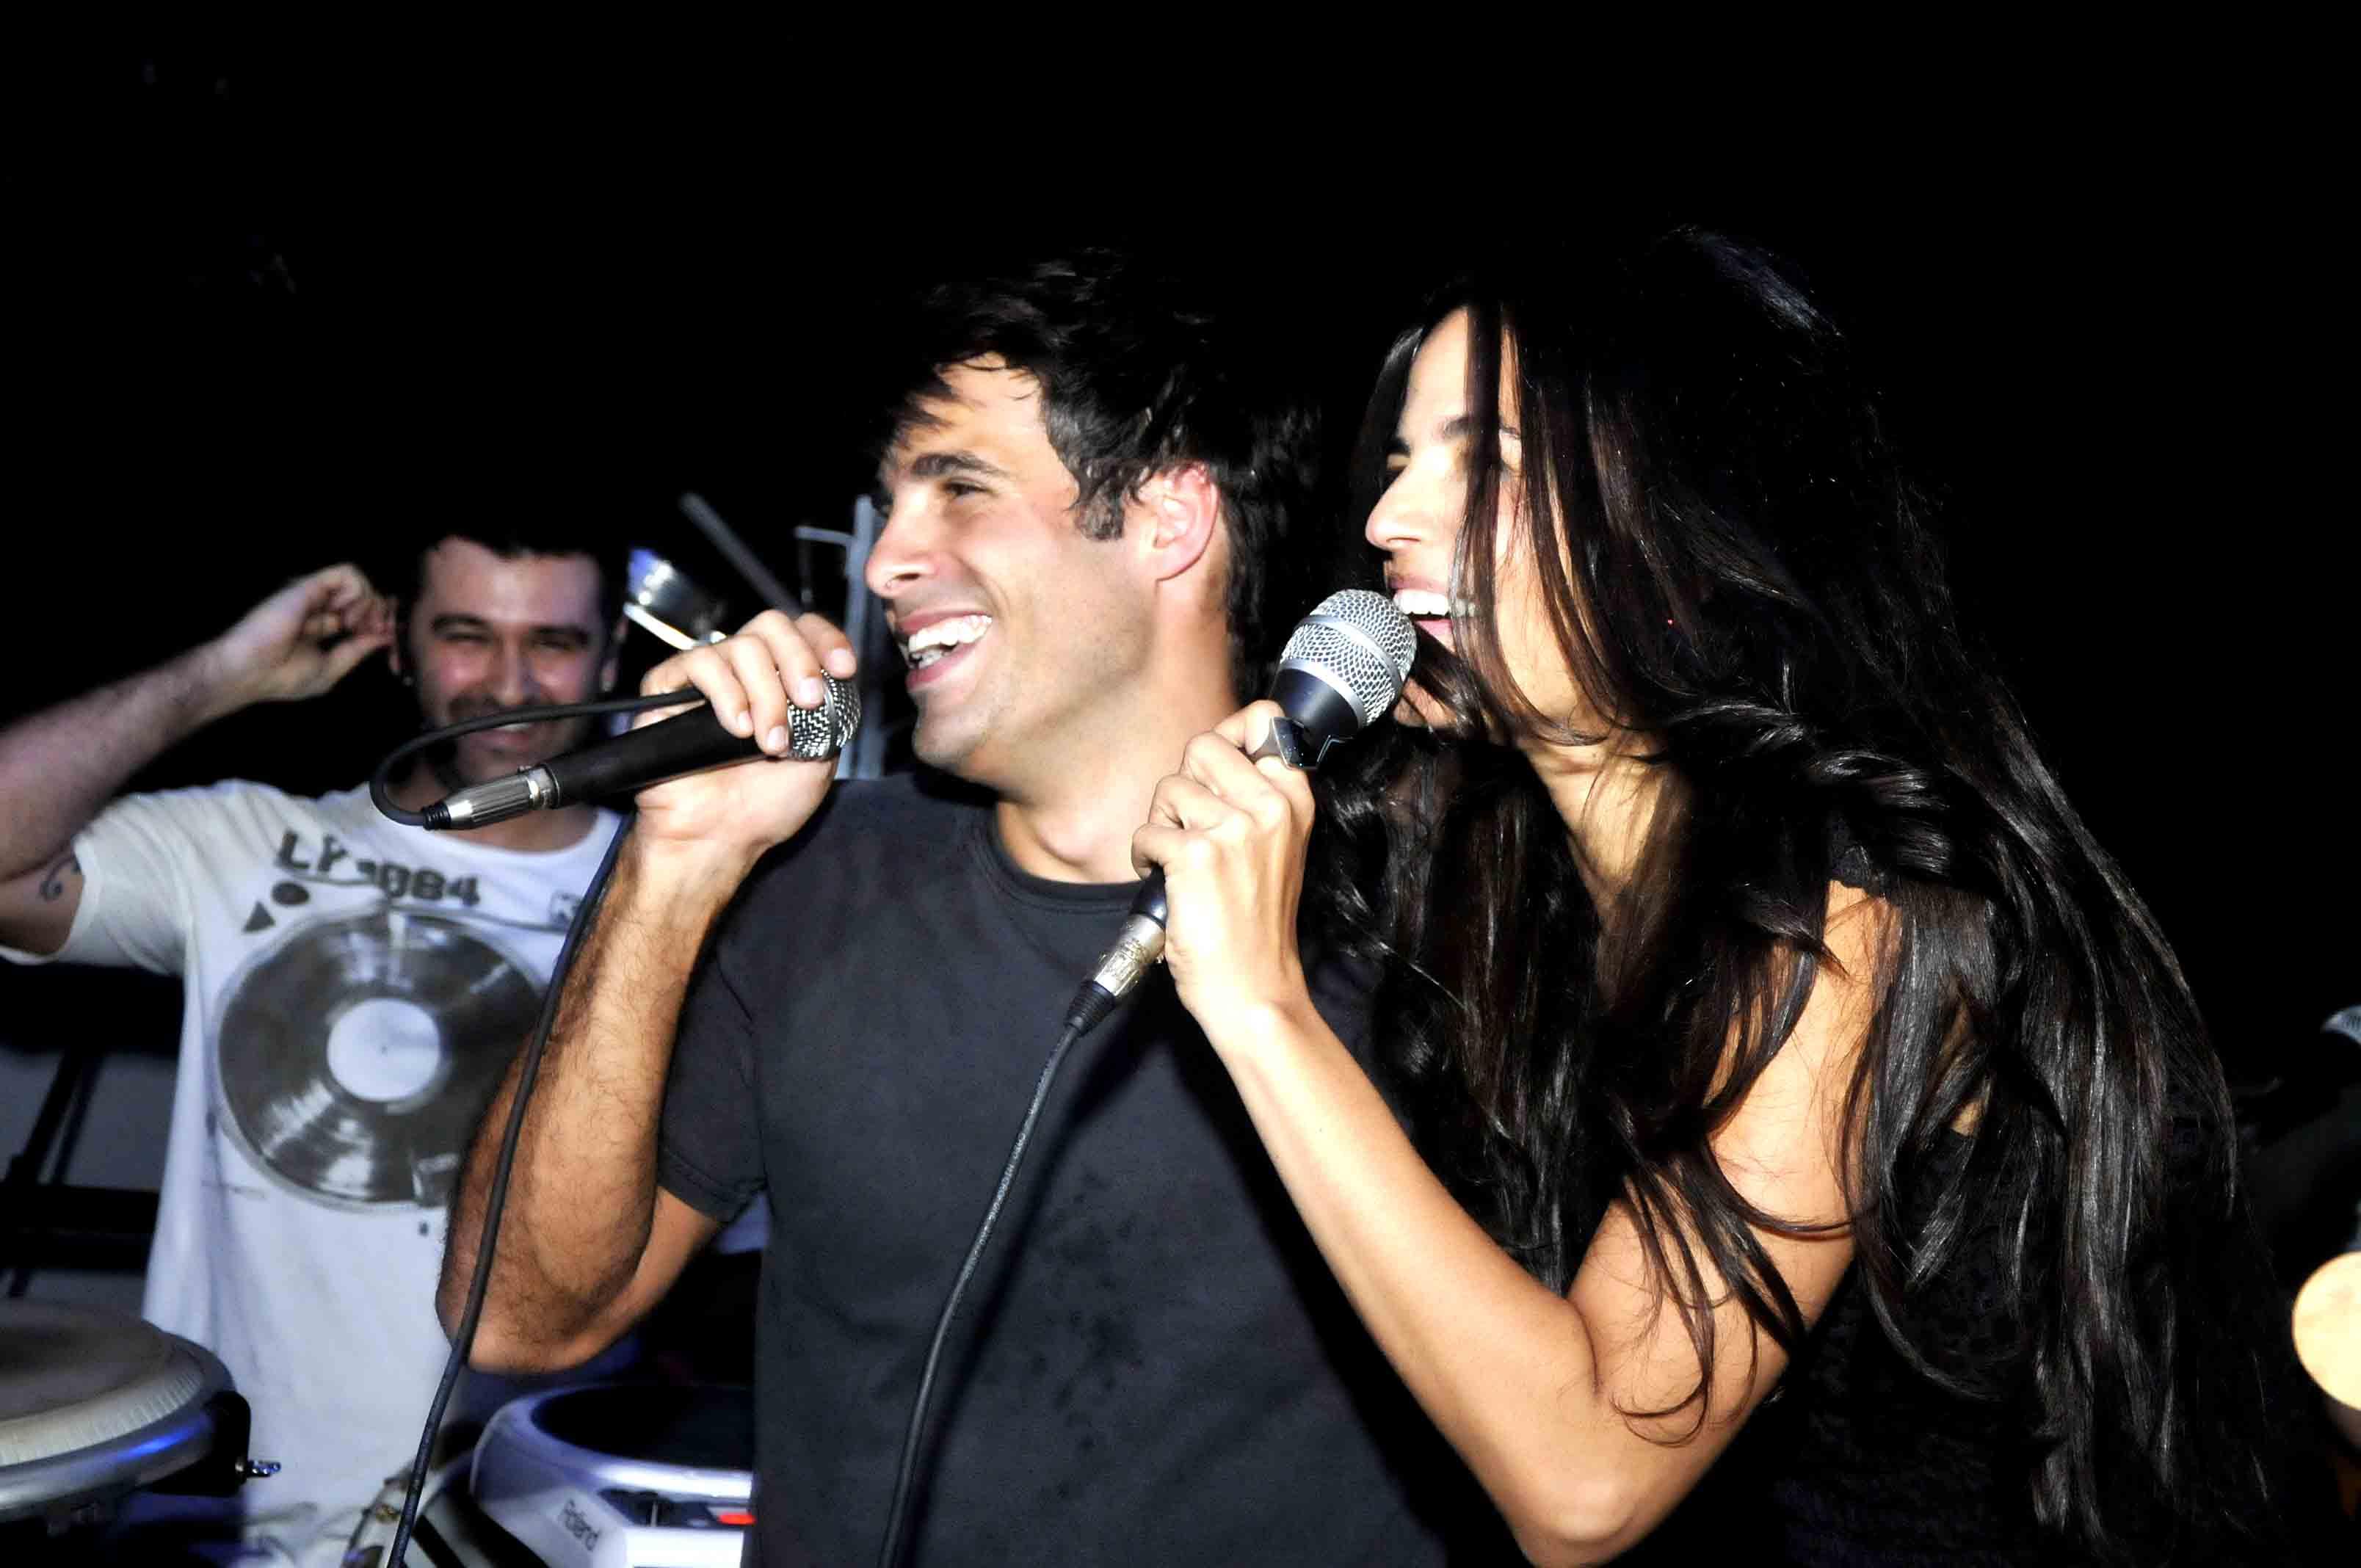 http://s.glbimg.com/jo/eg/f/original/2011/11/18/raoni_carneiro_e_emanuelle_araujo_01_ego.jpg